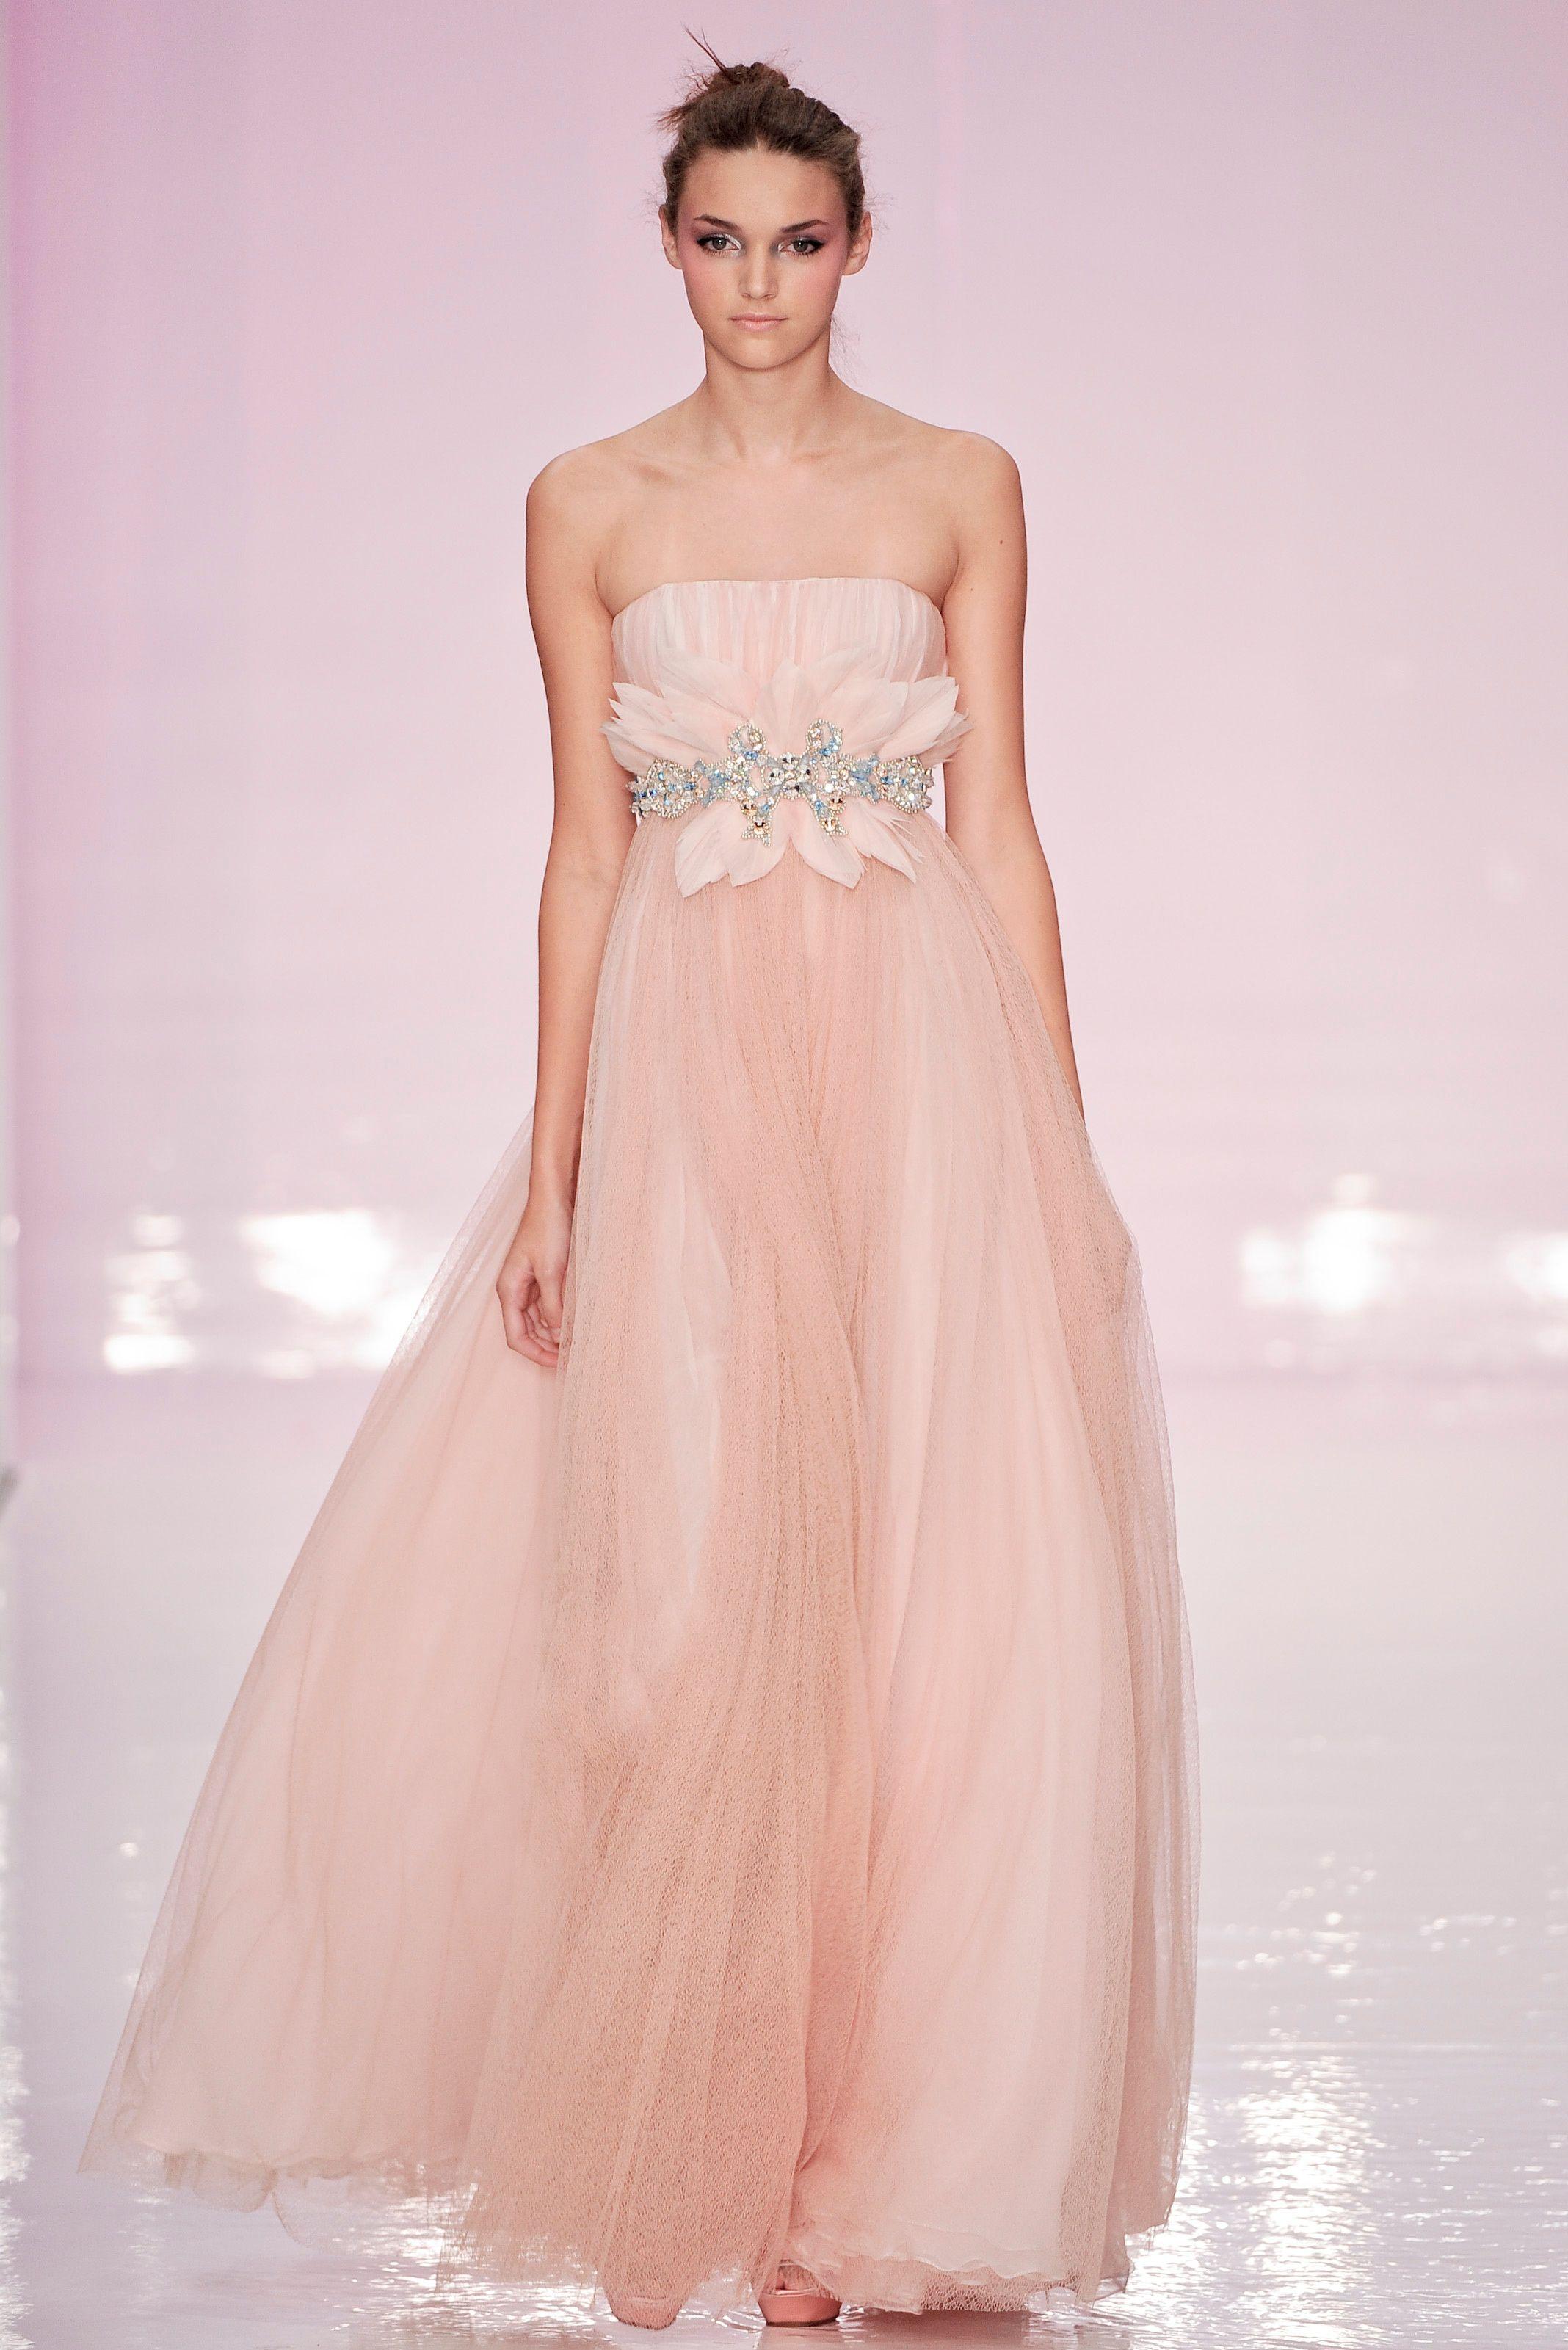 Encantador Vestido De Boda De La Vendimia Jenny Packham Regalo ...